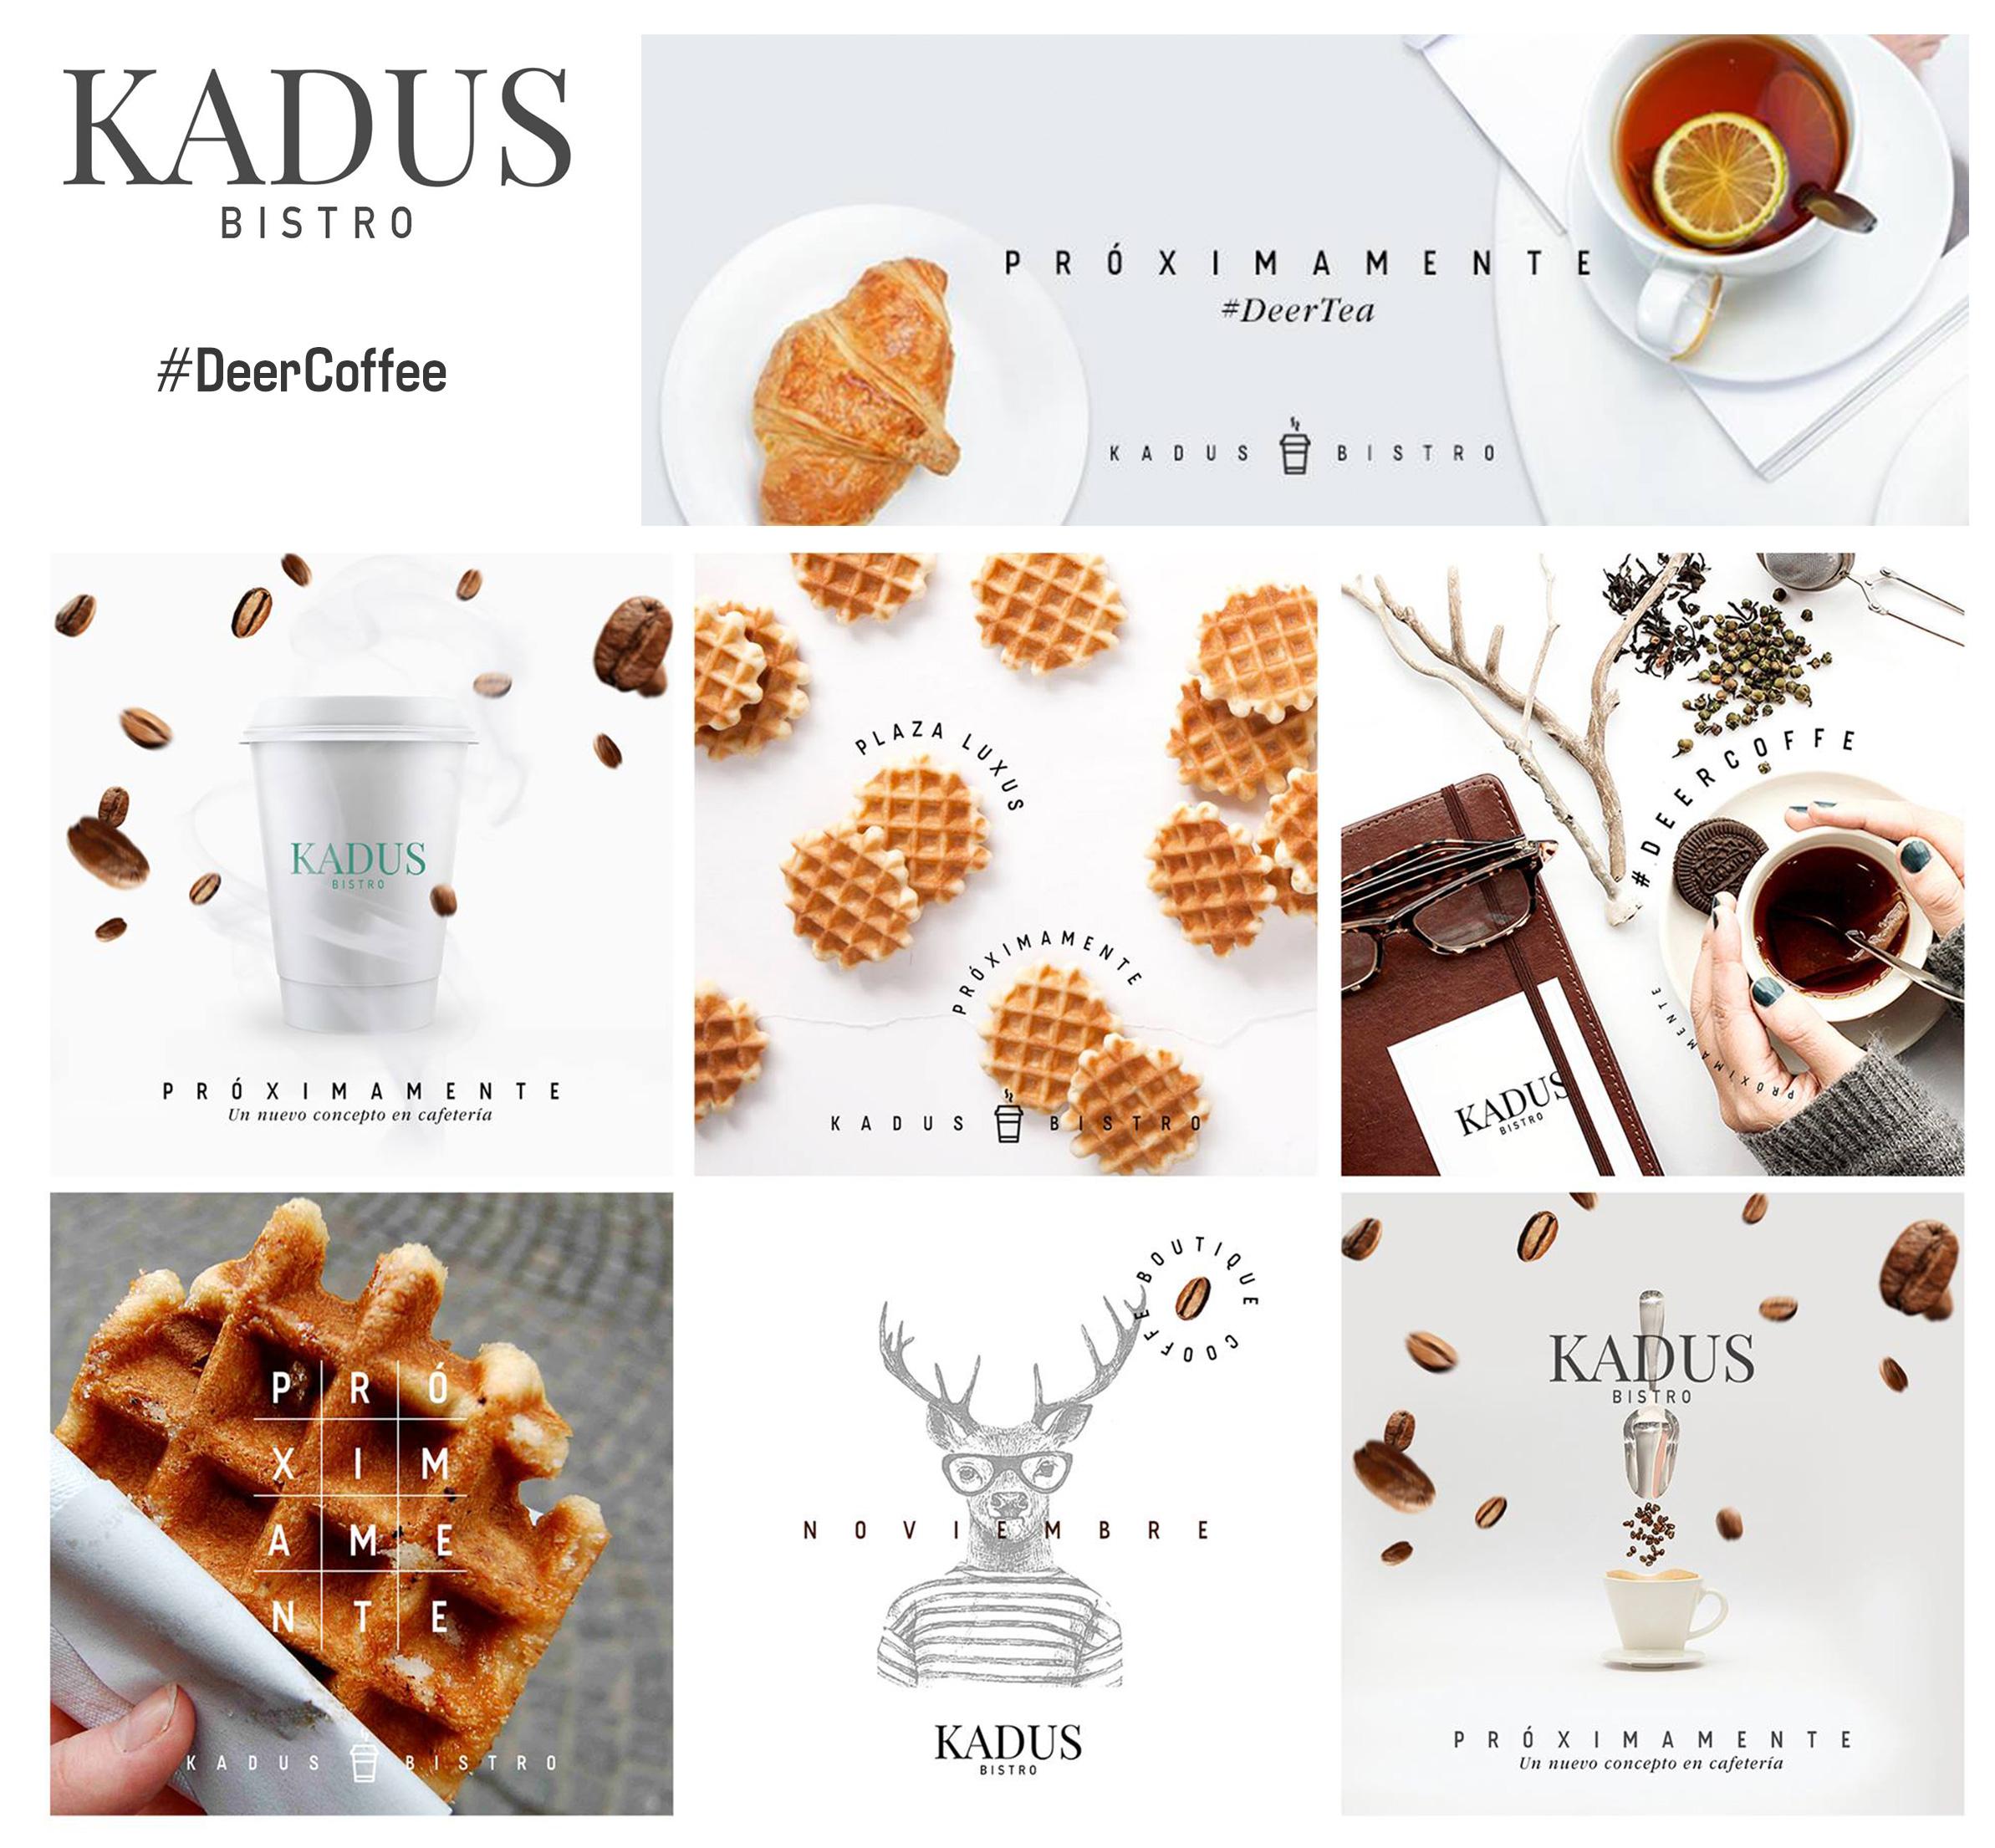 K A D U S  B I S T R O   Estrategia / Diseño / @kadusbistro / #DeerCoffee